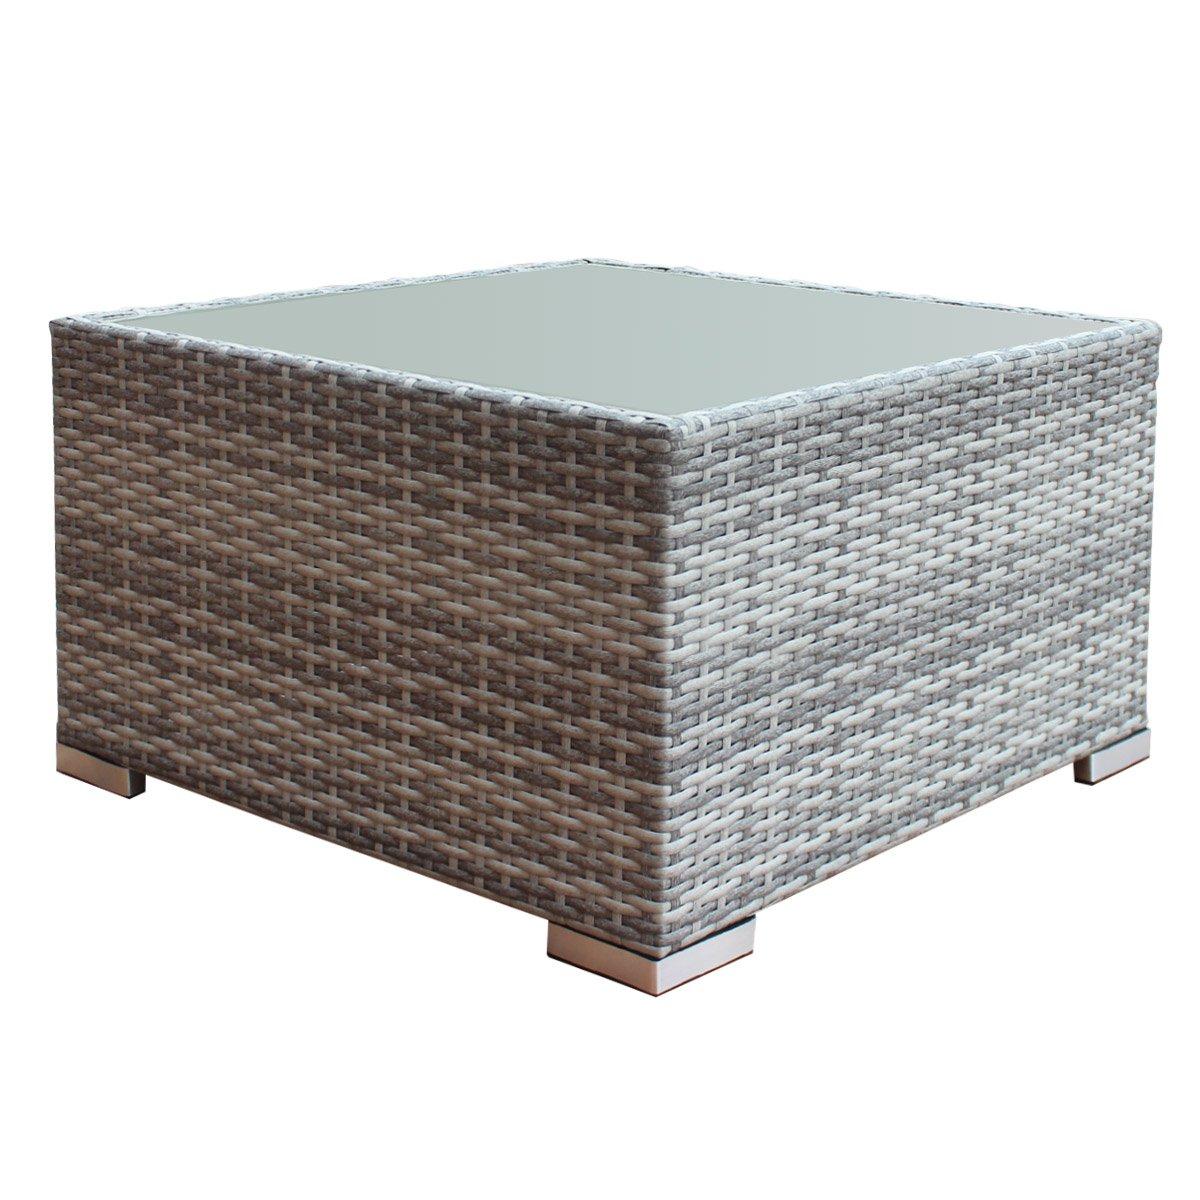 Tangkula Wicker Sofa Outdoor Patio Wicker Infinitely Combination Sofa Set (D-Coffee Table) by Tangkula